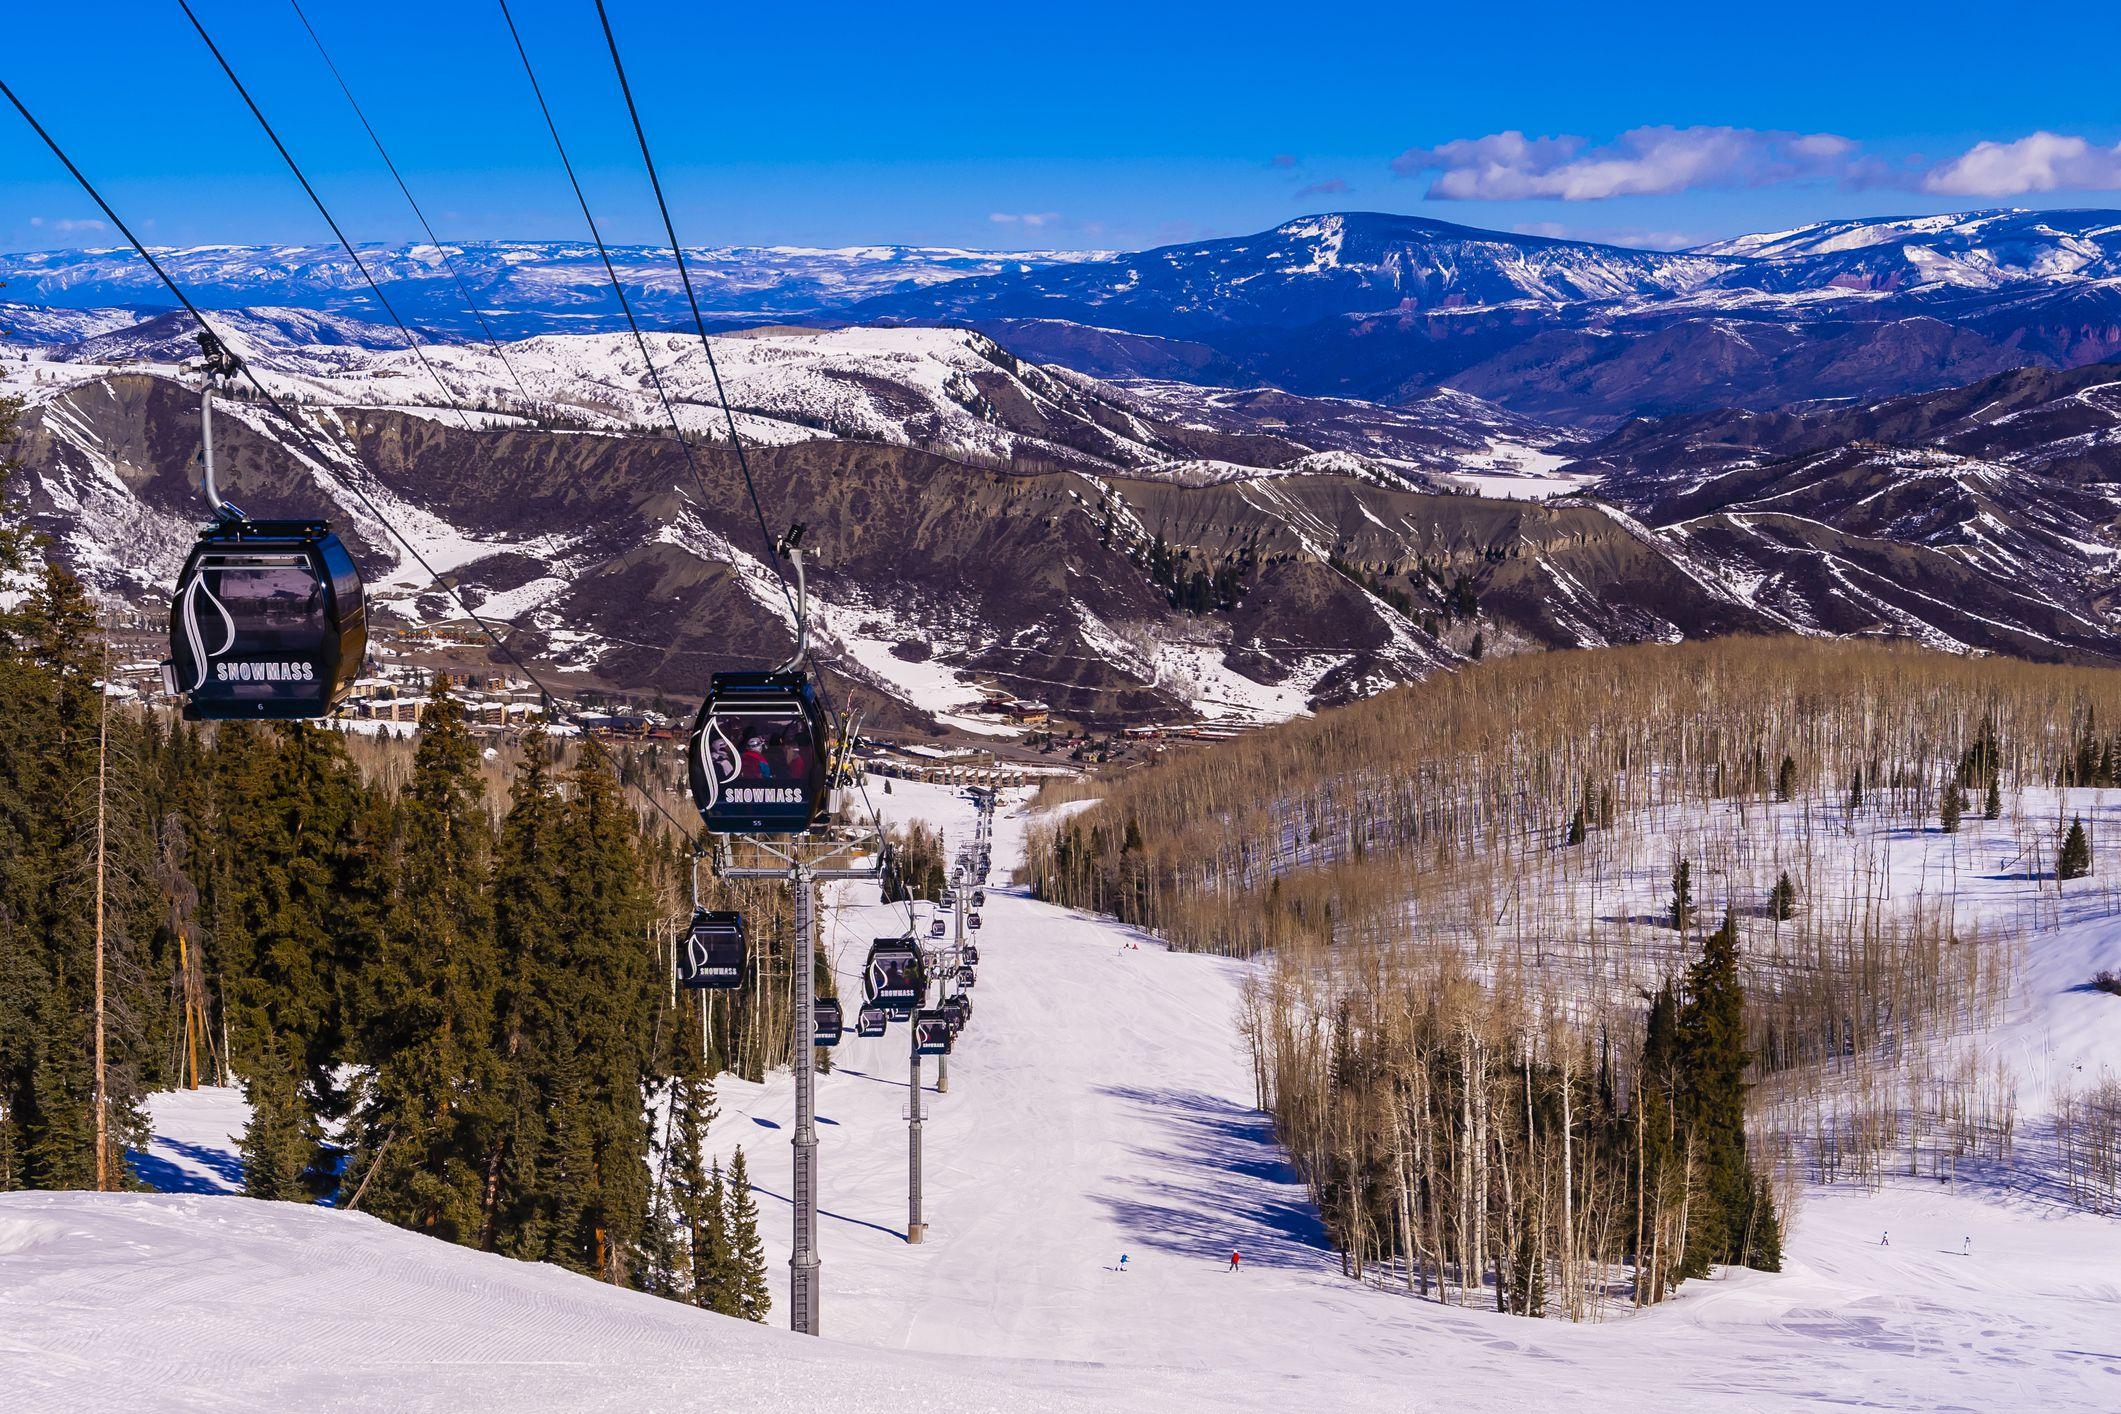 Ski Resort Guide Snowmass Ski Resort Colorado